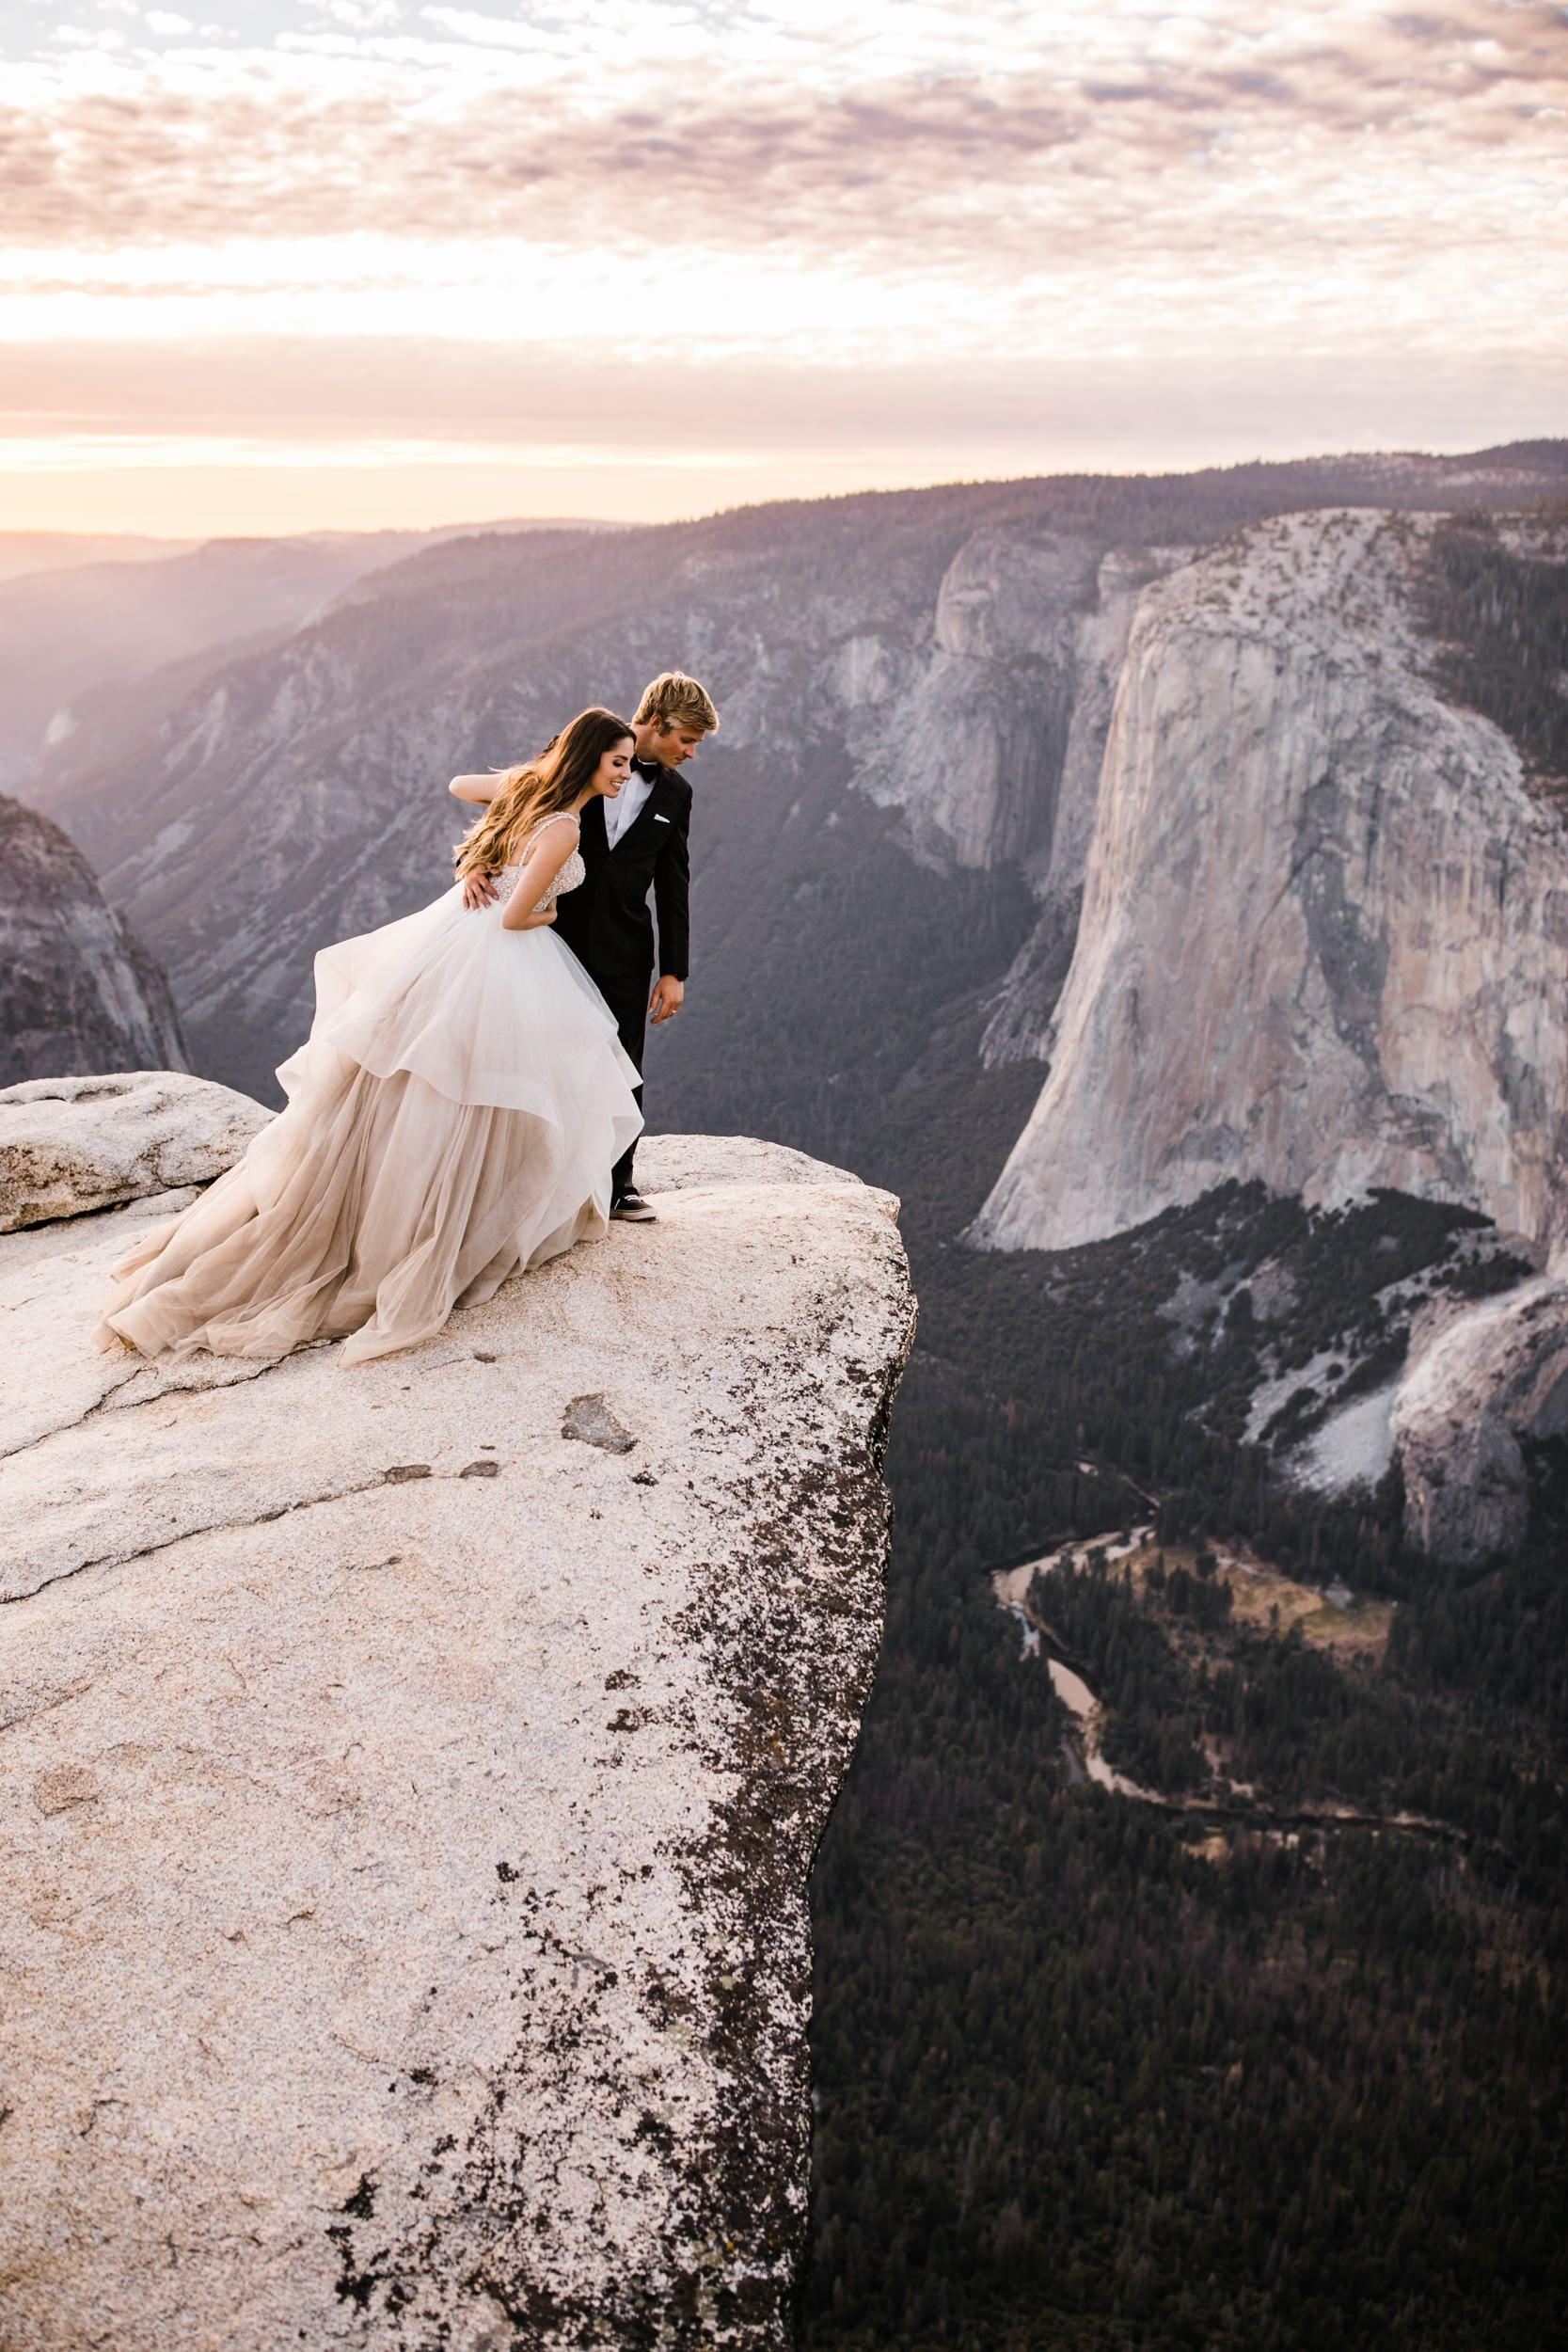 Yosemite National Park Intimate Wedding At Glacier Point Hike To Taft Point Adventure Elopement Photographer Adventure Wedding Elopement Photographers I Elope Wedding Yosemite Wedding Adventure Wedding